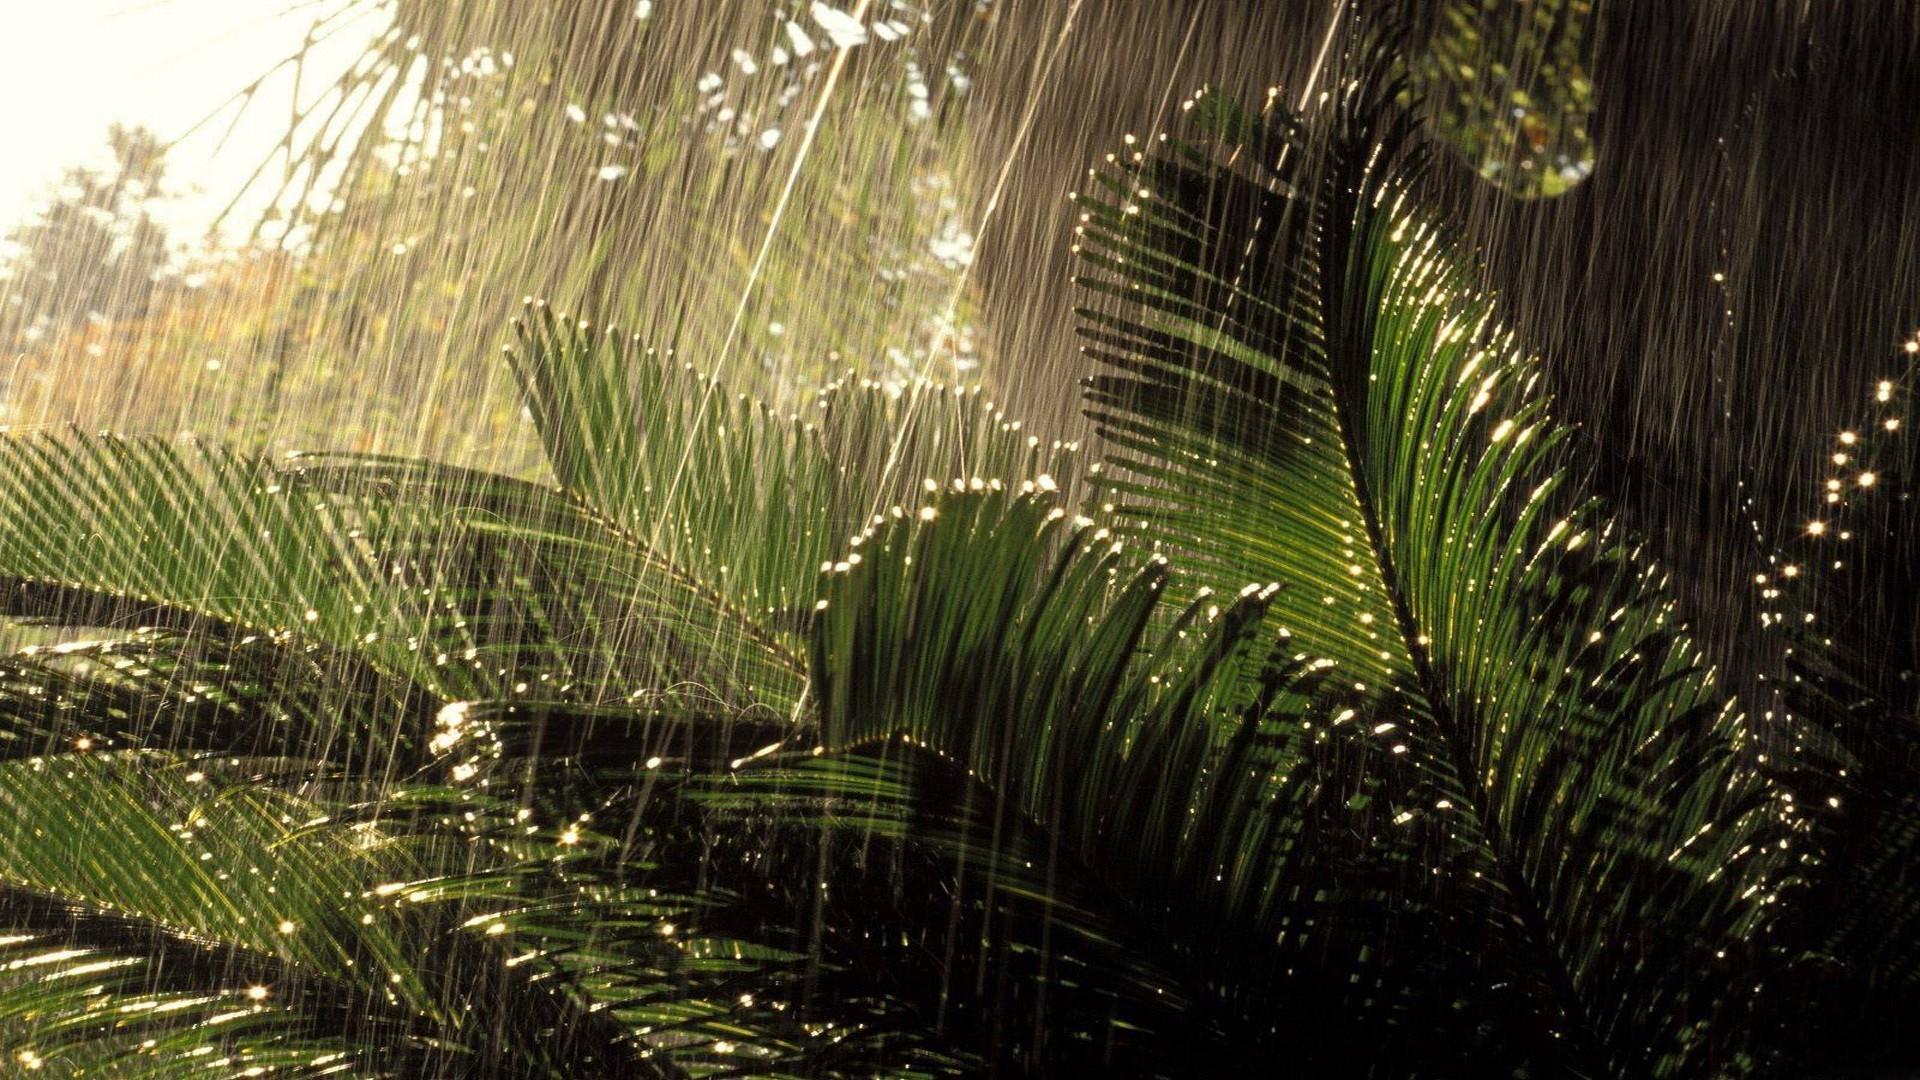 rain live wallpaper free download